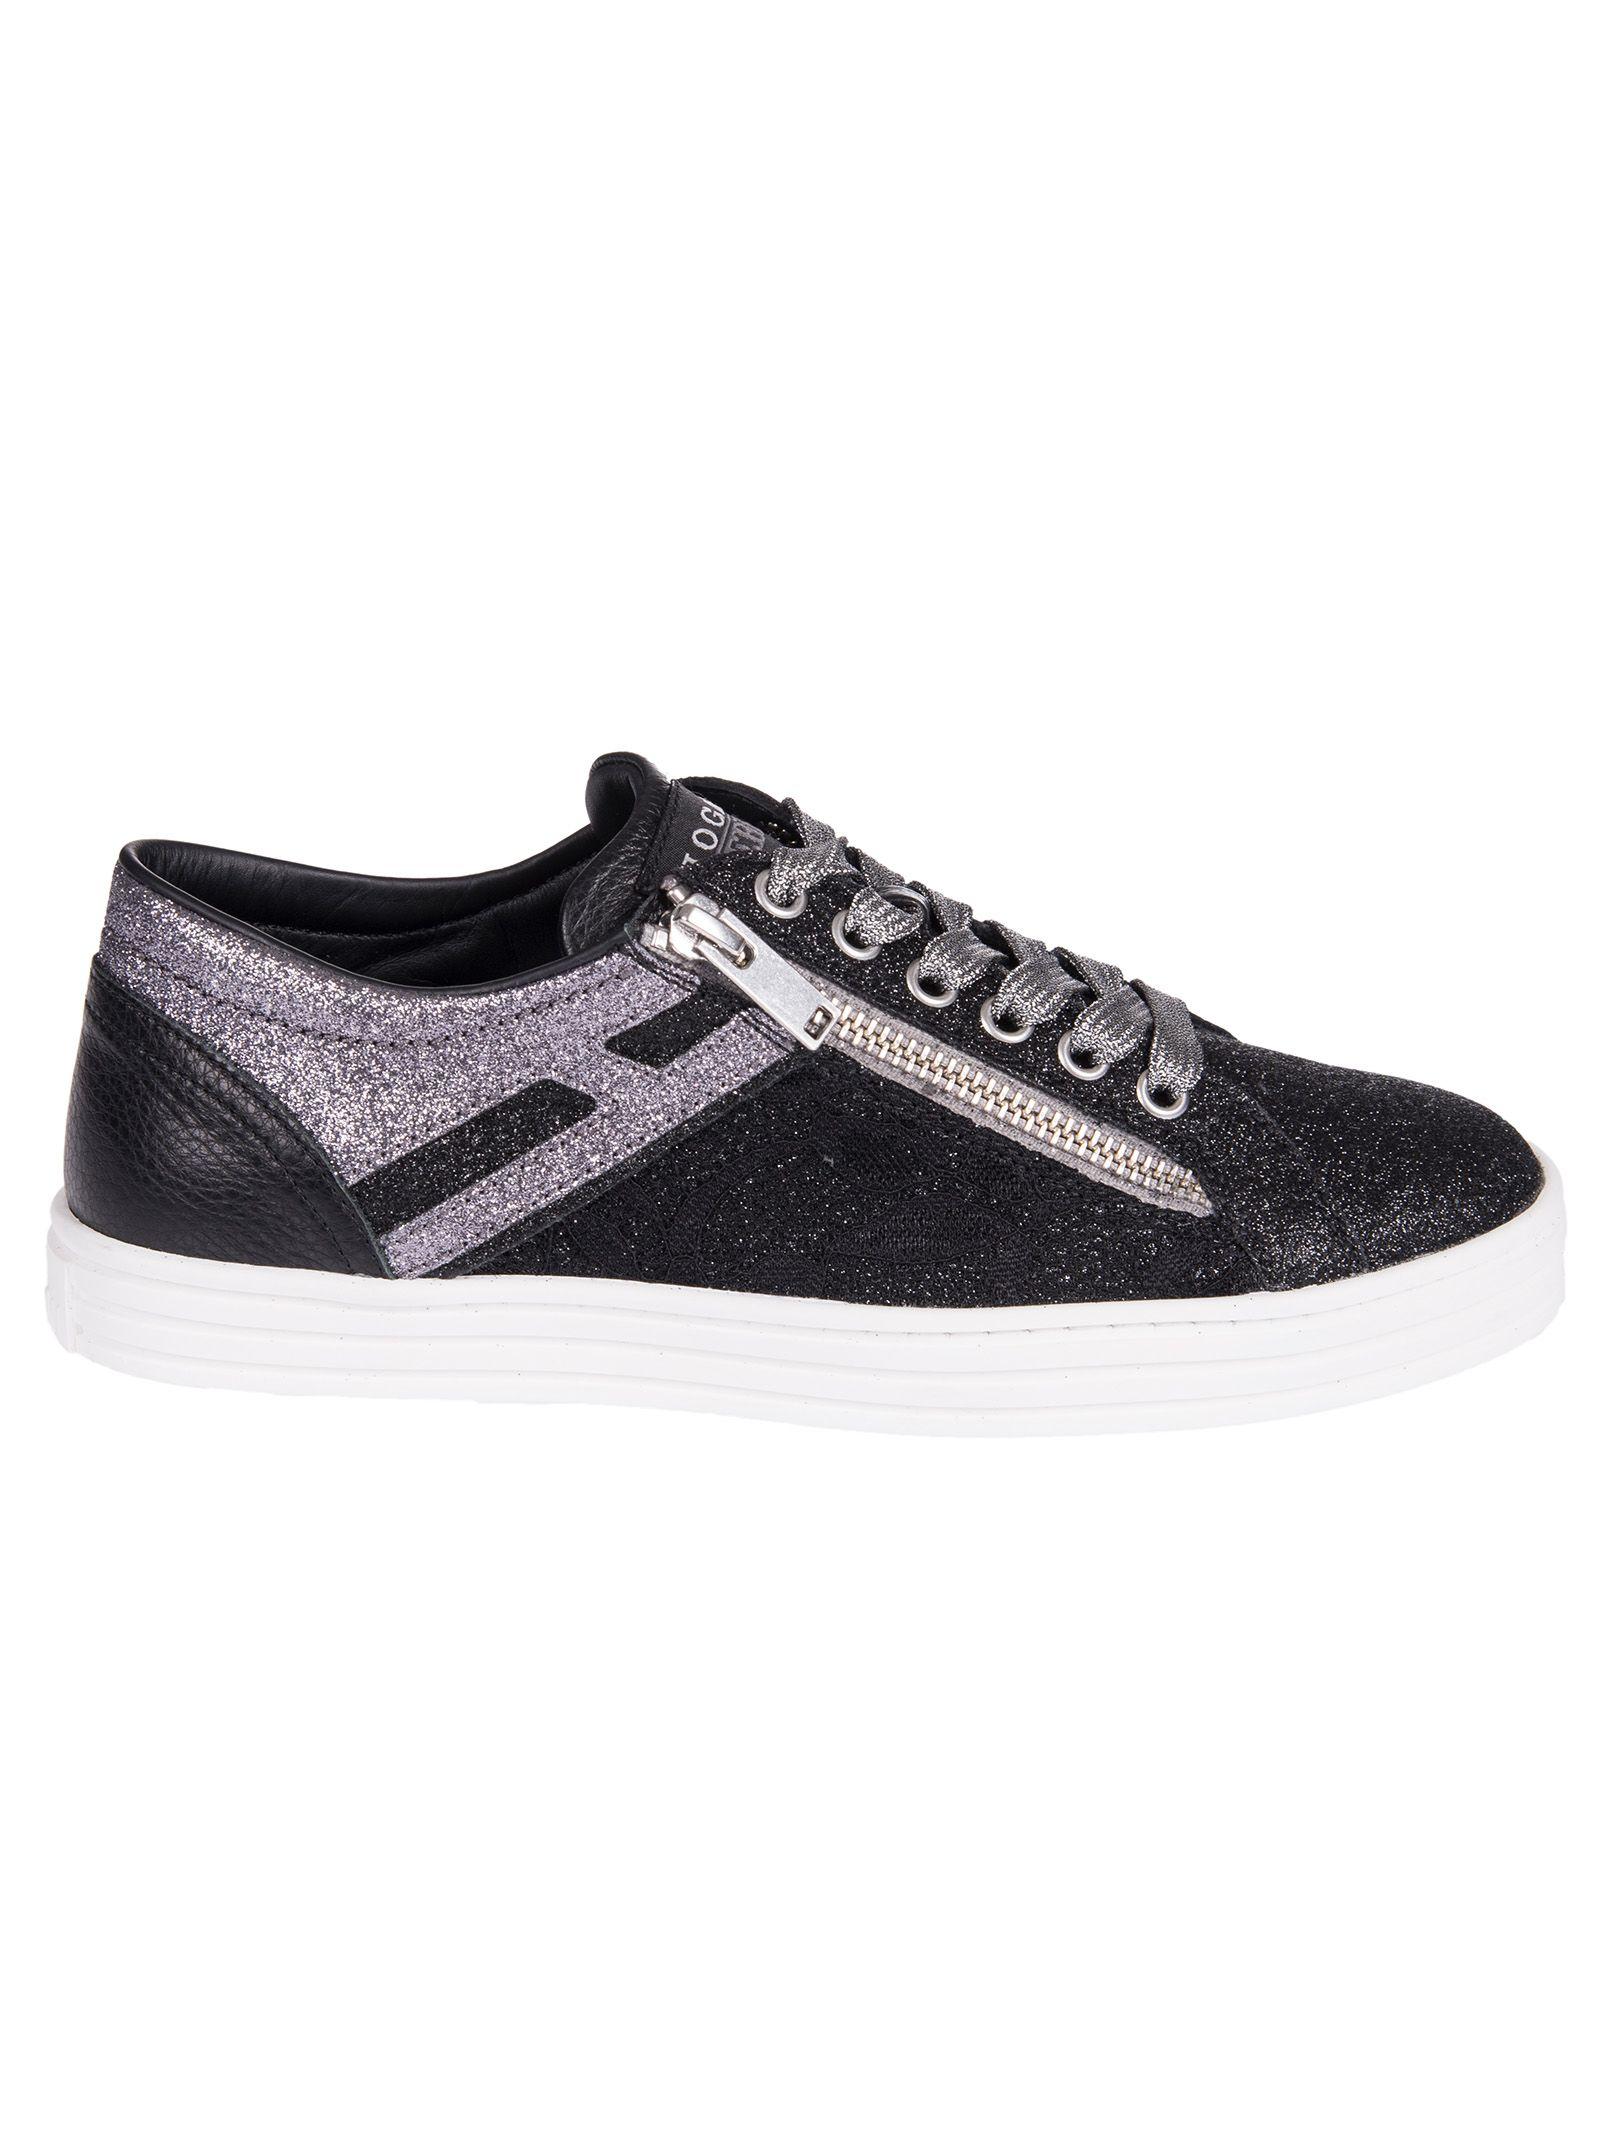 Hogan Rebel R141 Zip Sneakers